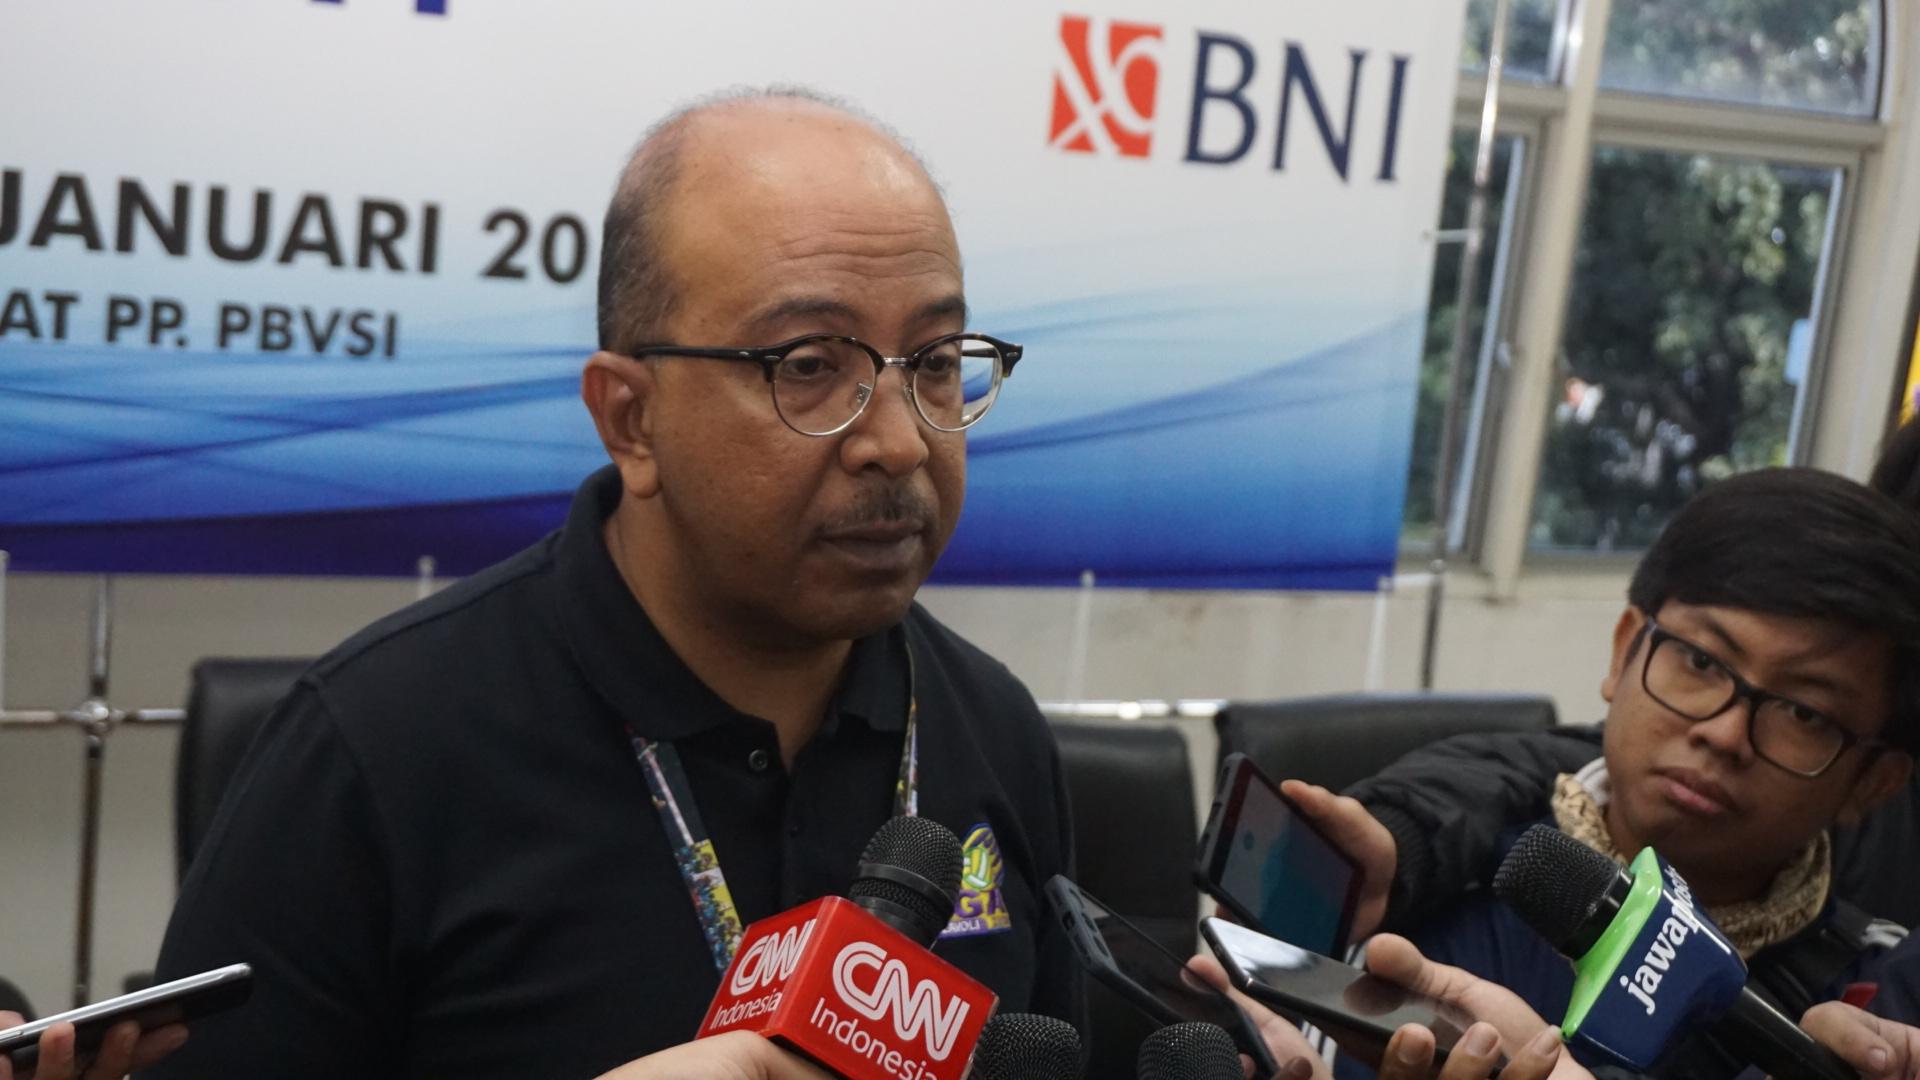 Lewat Proliga, Atlet Voli Indonesia Bisa Perbaiki Kualitas Hidup